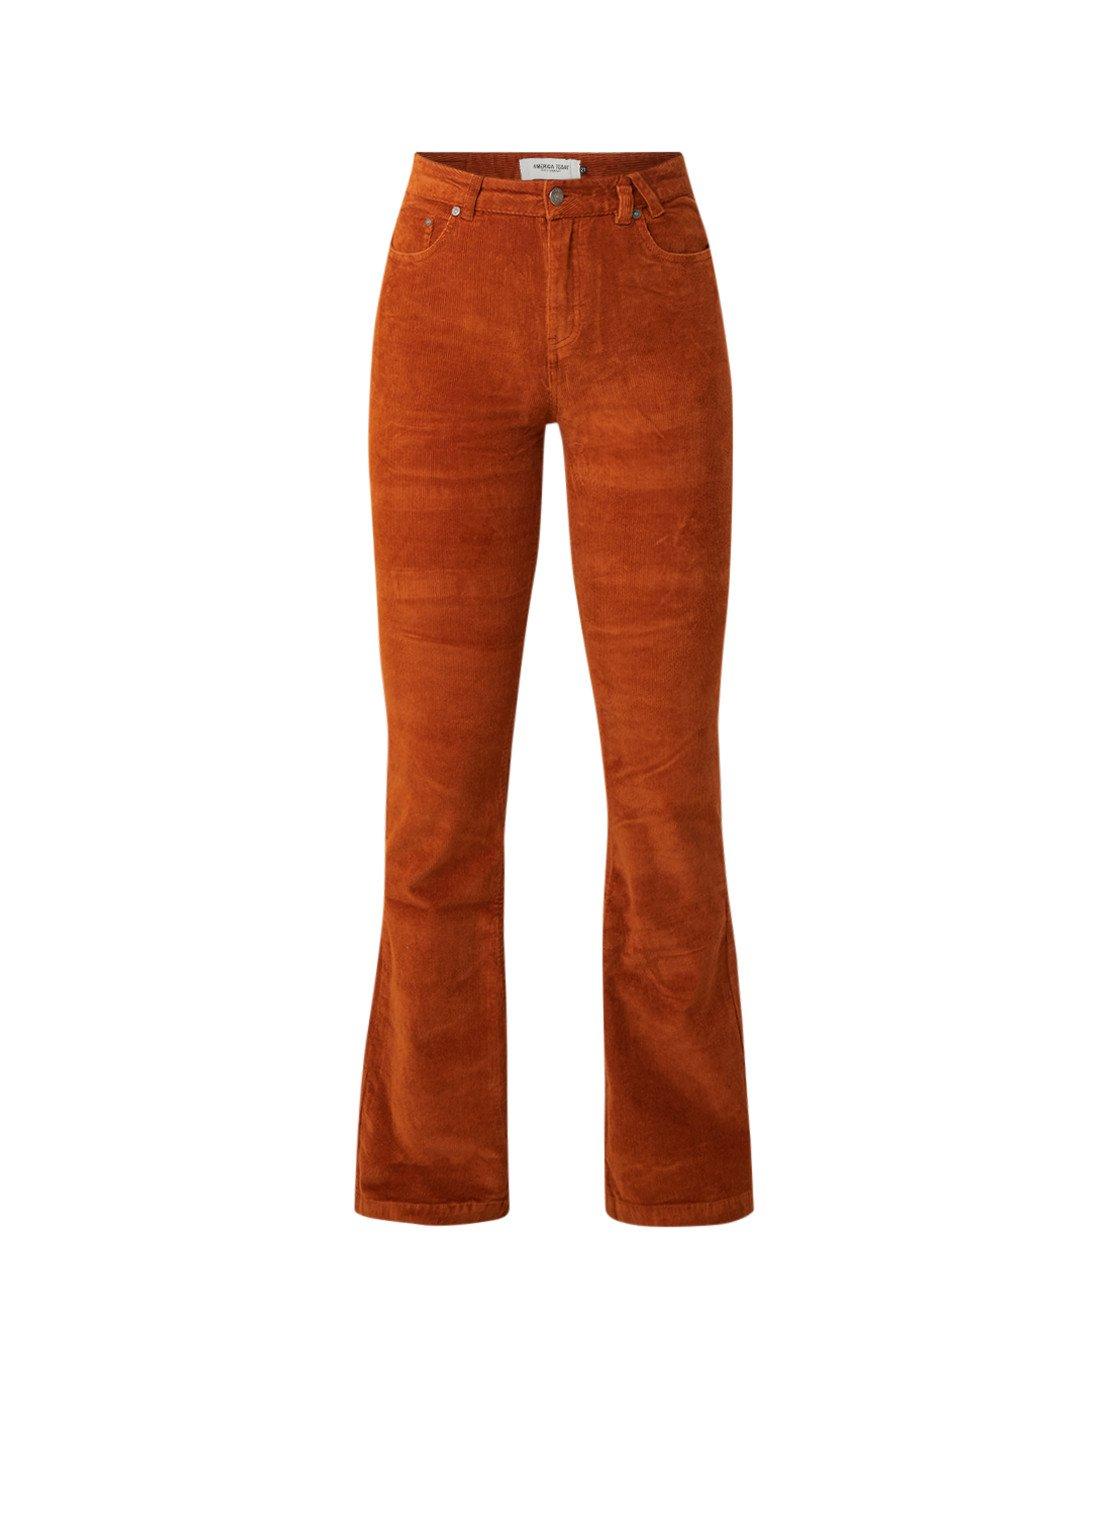 29adc0bf6ce Nette broeken online kopen | Fashionchick.nl | Groot aanbod